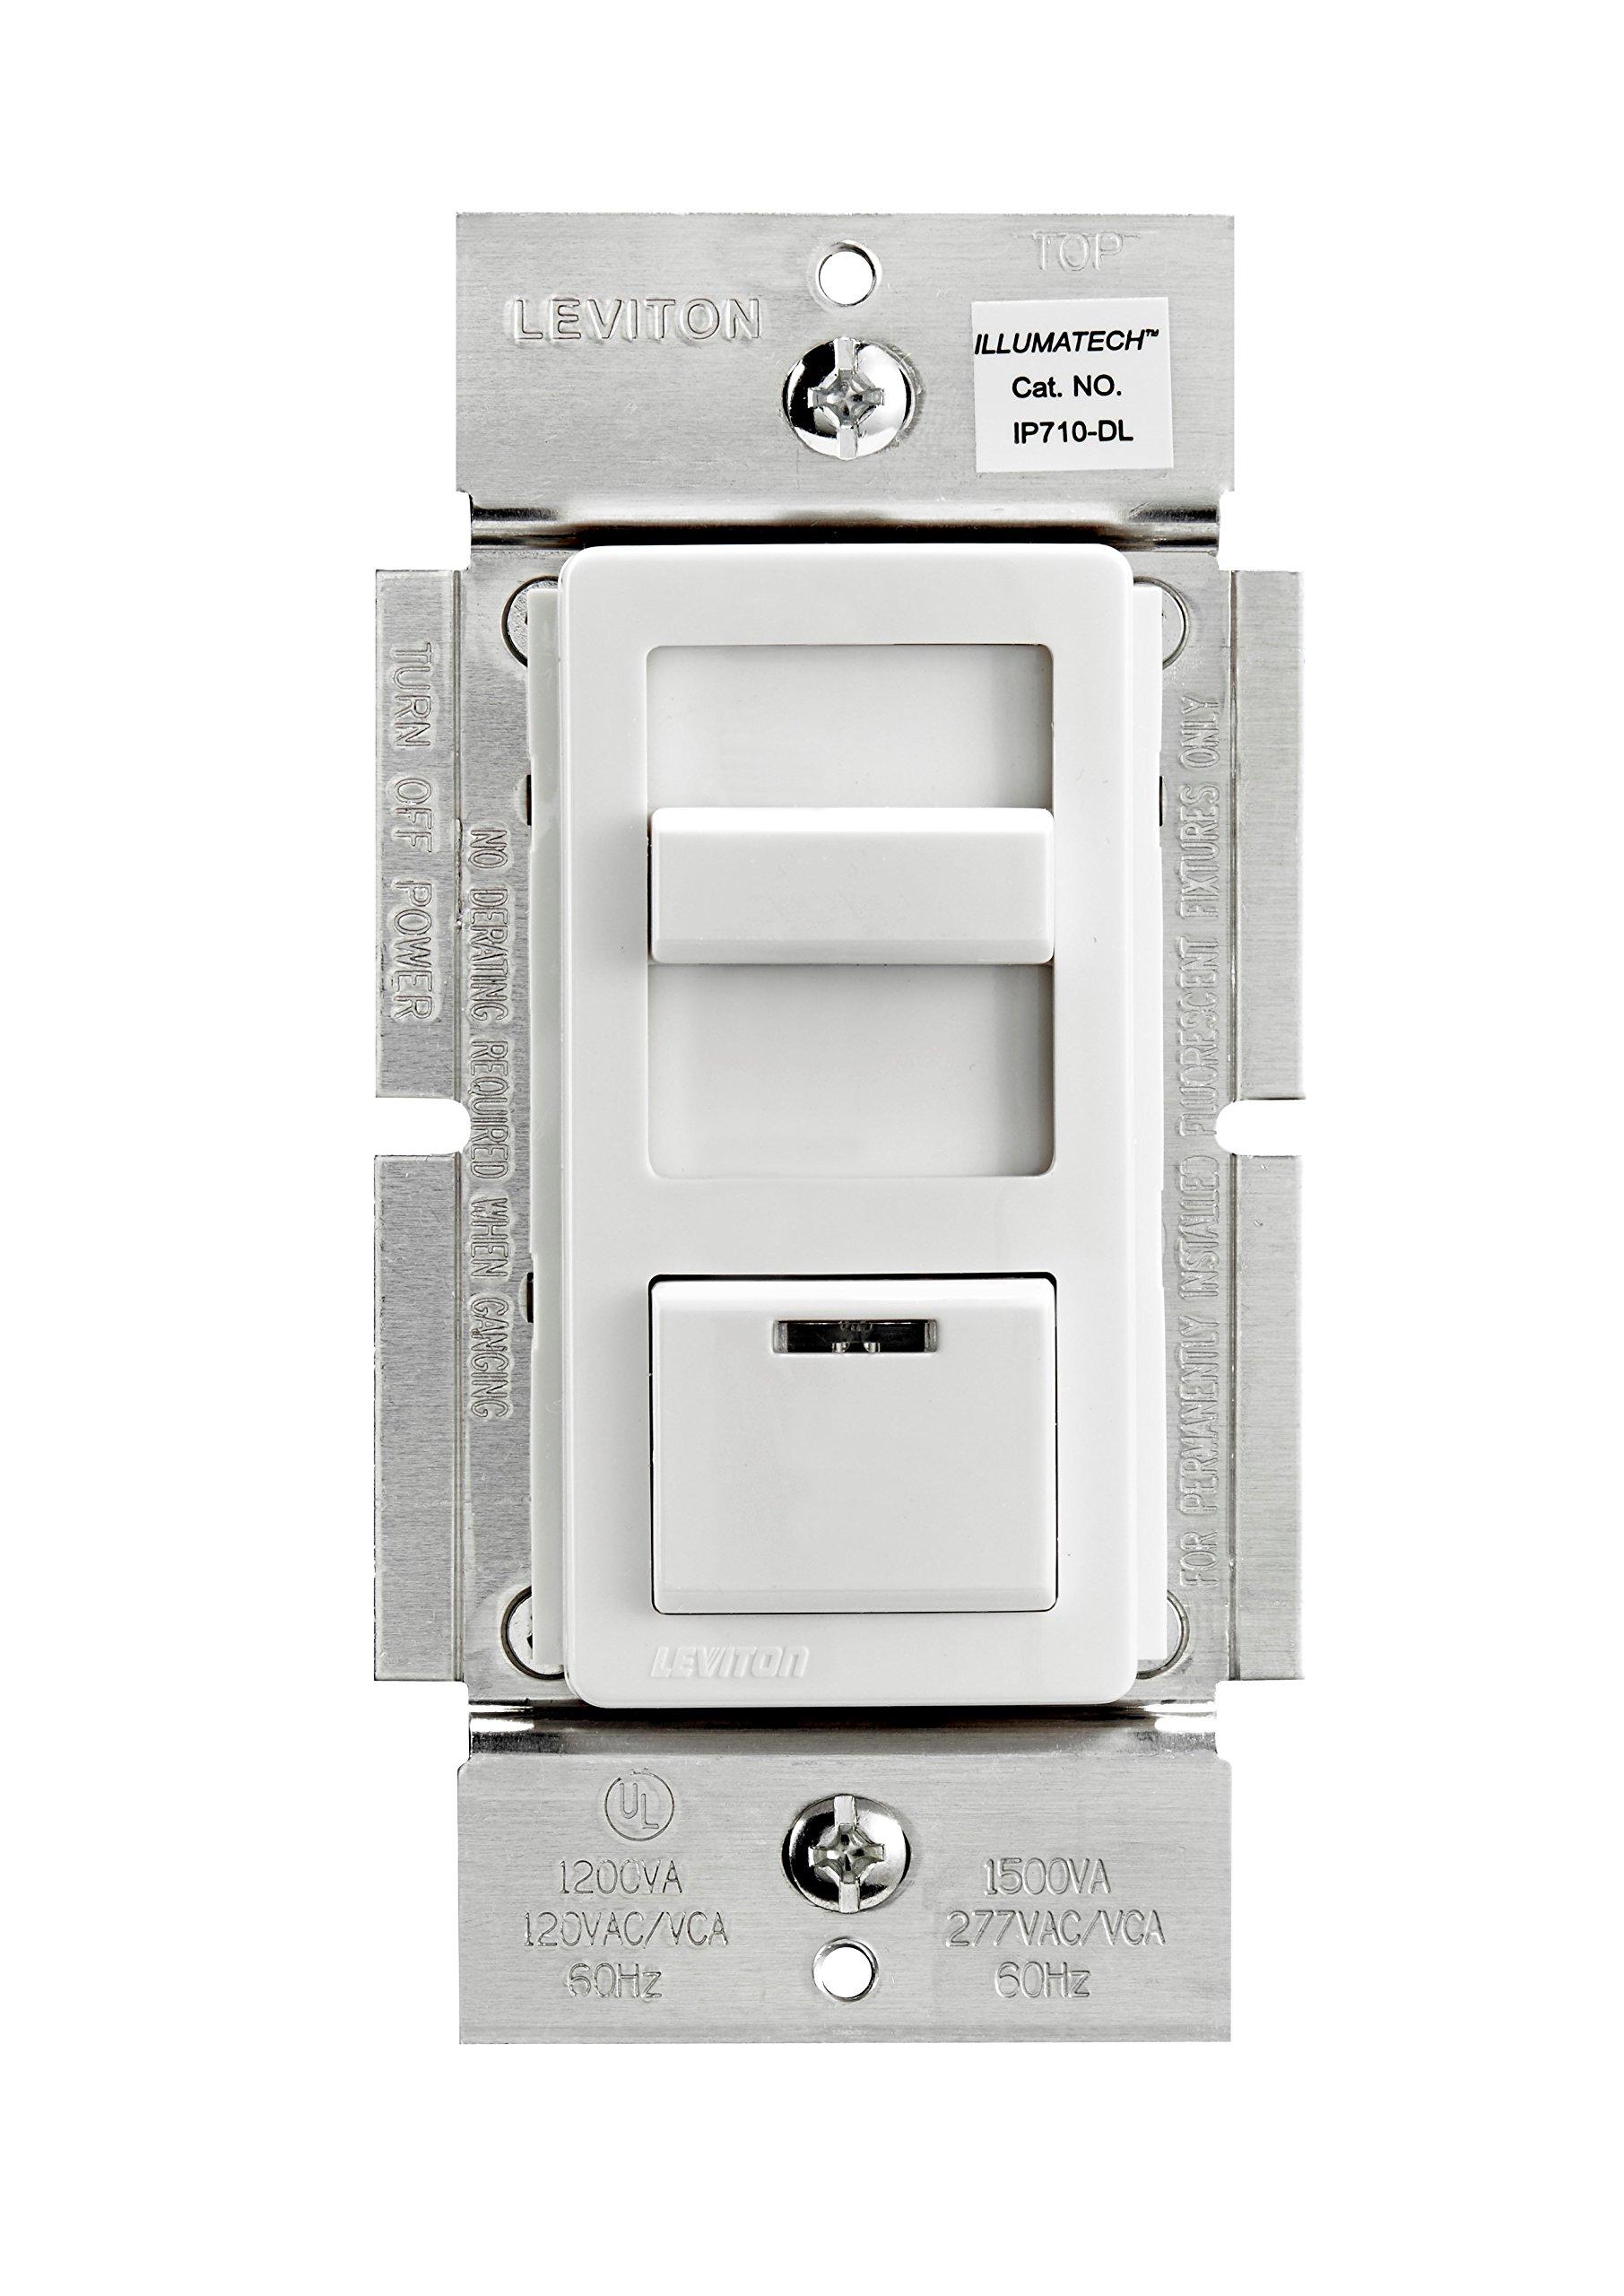 Leviton IP710-DLZ IllumaTech 1200VA Preset Fluorescent Slide Dimmer, Single Pole and 3-Way, White/Ivory/Light Almond